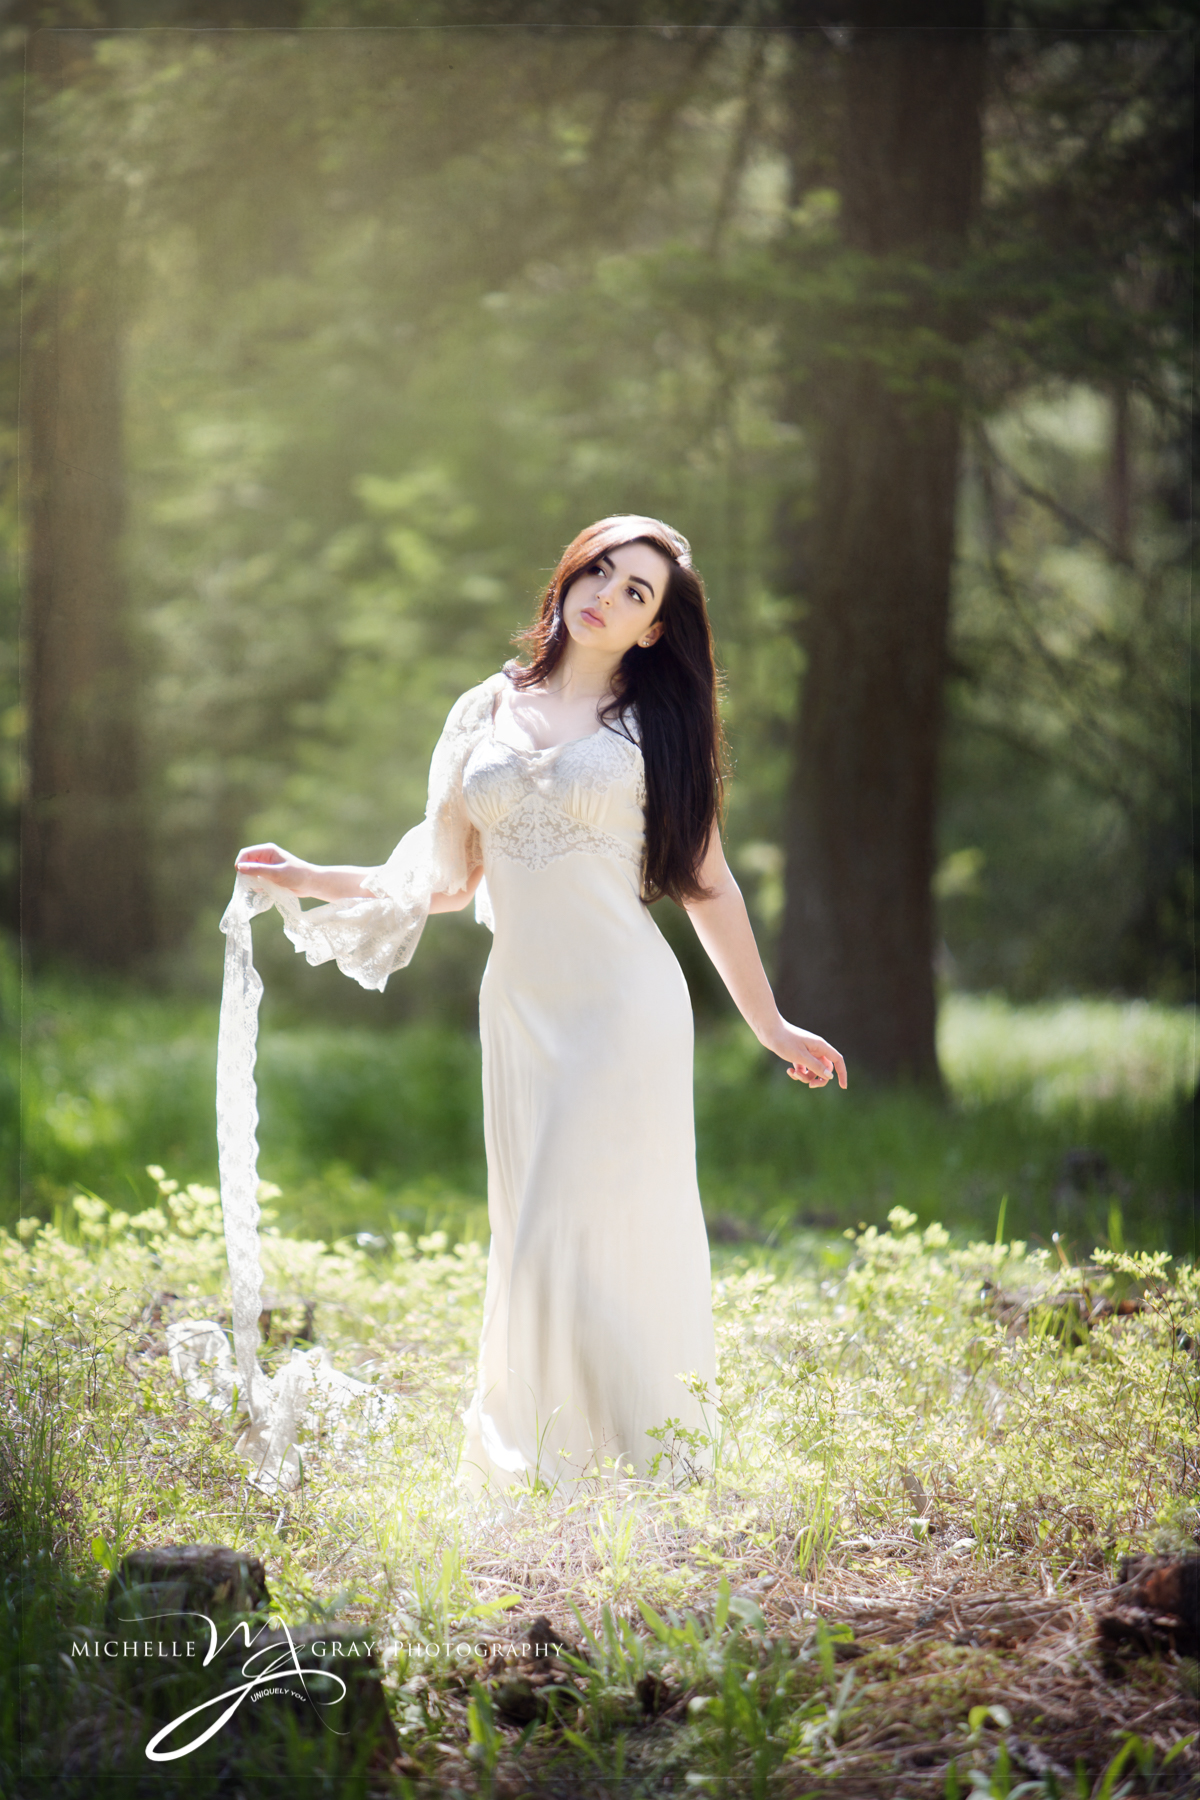 Fine art high school senior beauty portrait in a forest